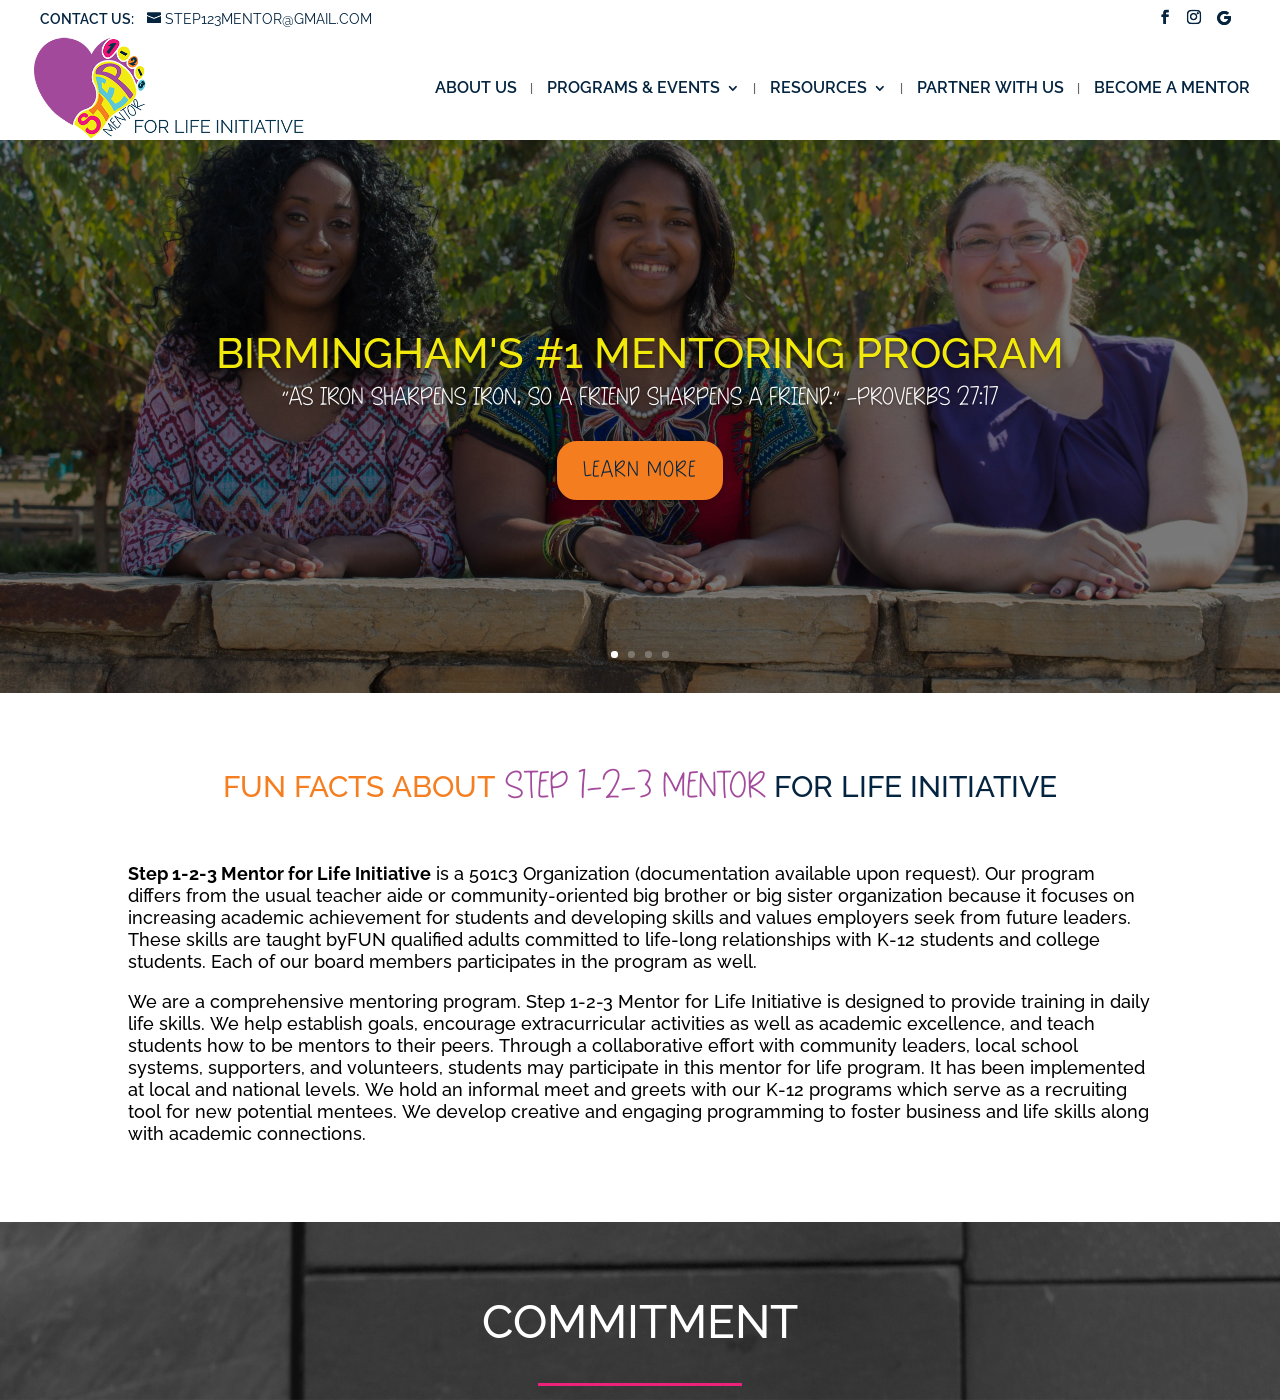 Birmingham-Website-Design-Agency-C-Kinion-Design-Step-1-2-3-Mentor-For-Life-Initiative